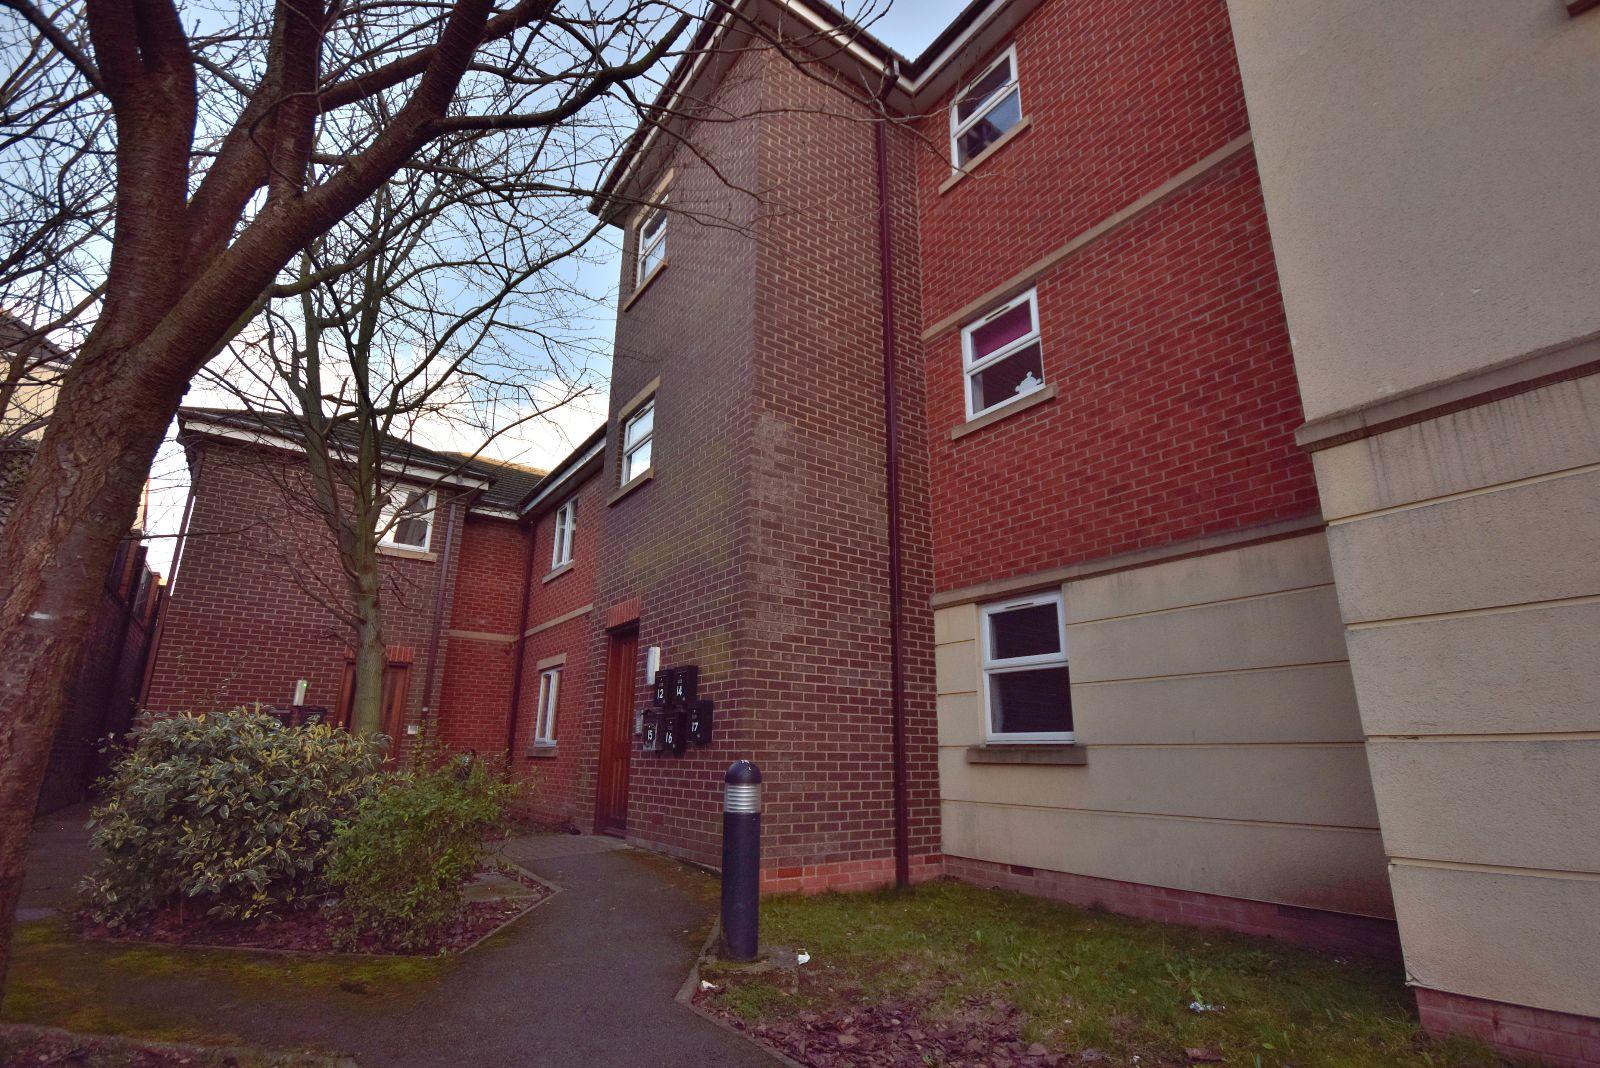 Richard Parkes House Lloyd Street Wednesbury